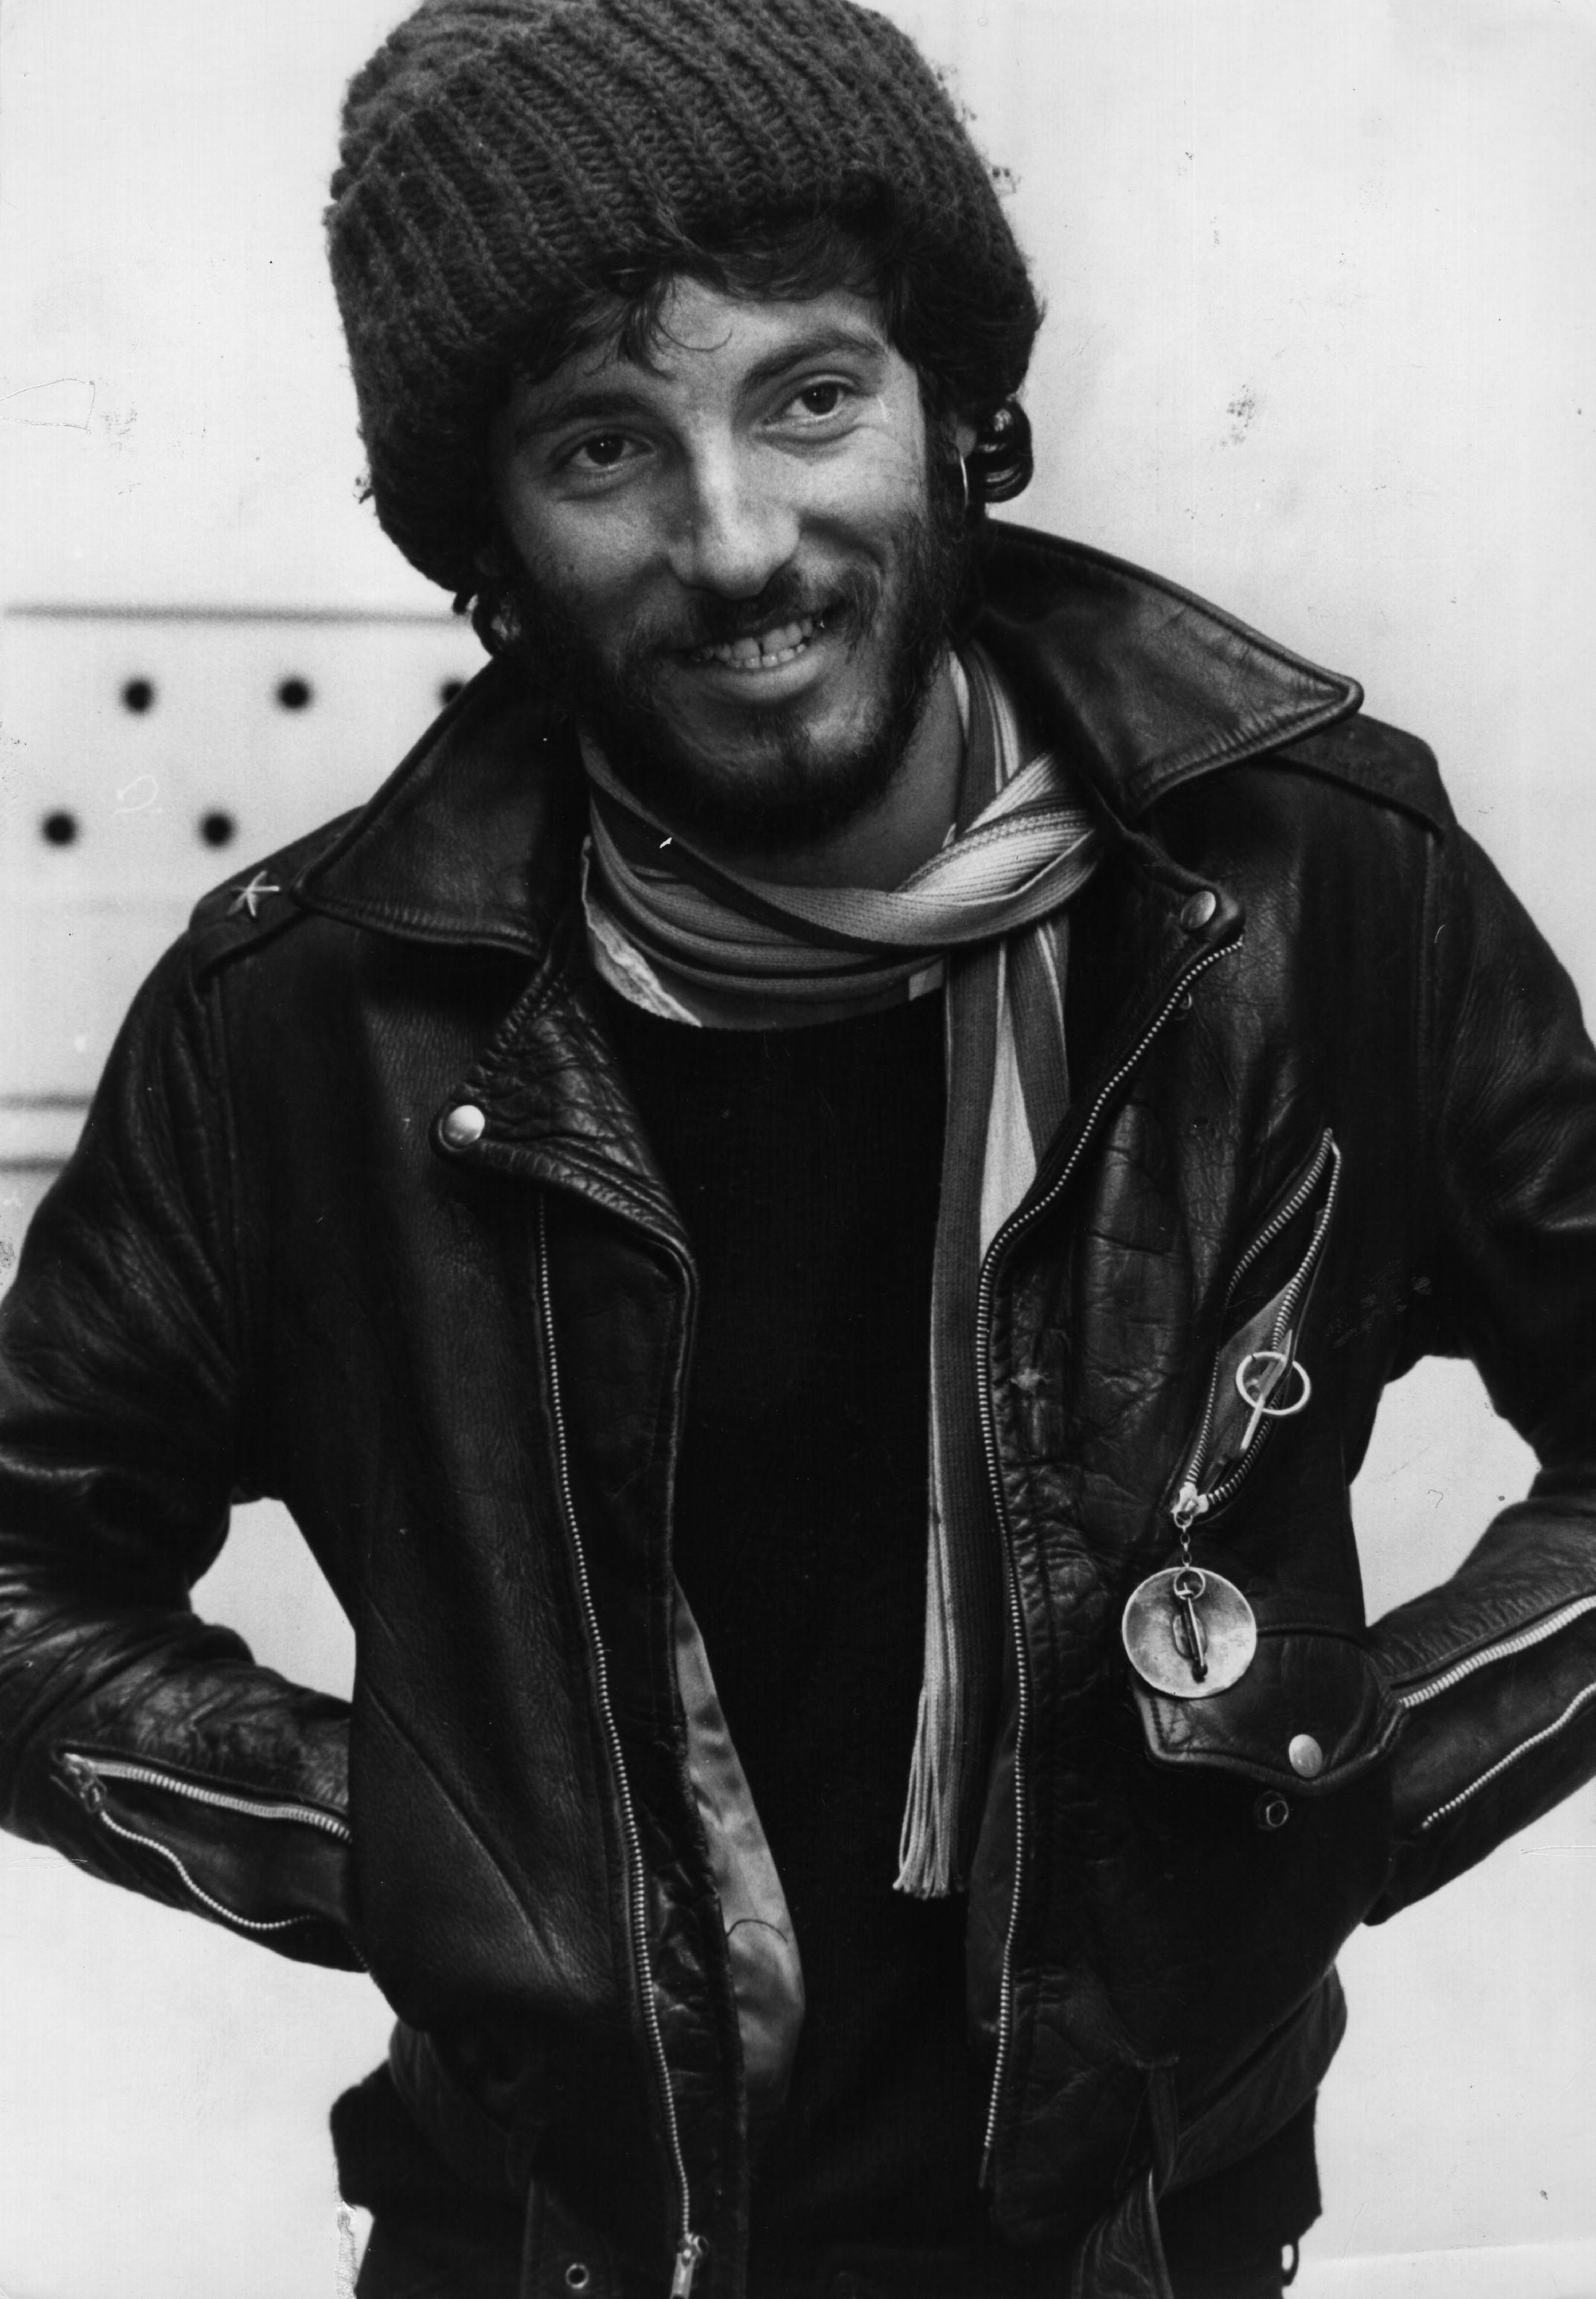 Bruce Springsteen in 1975